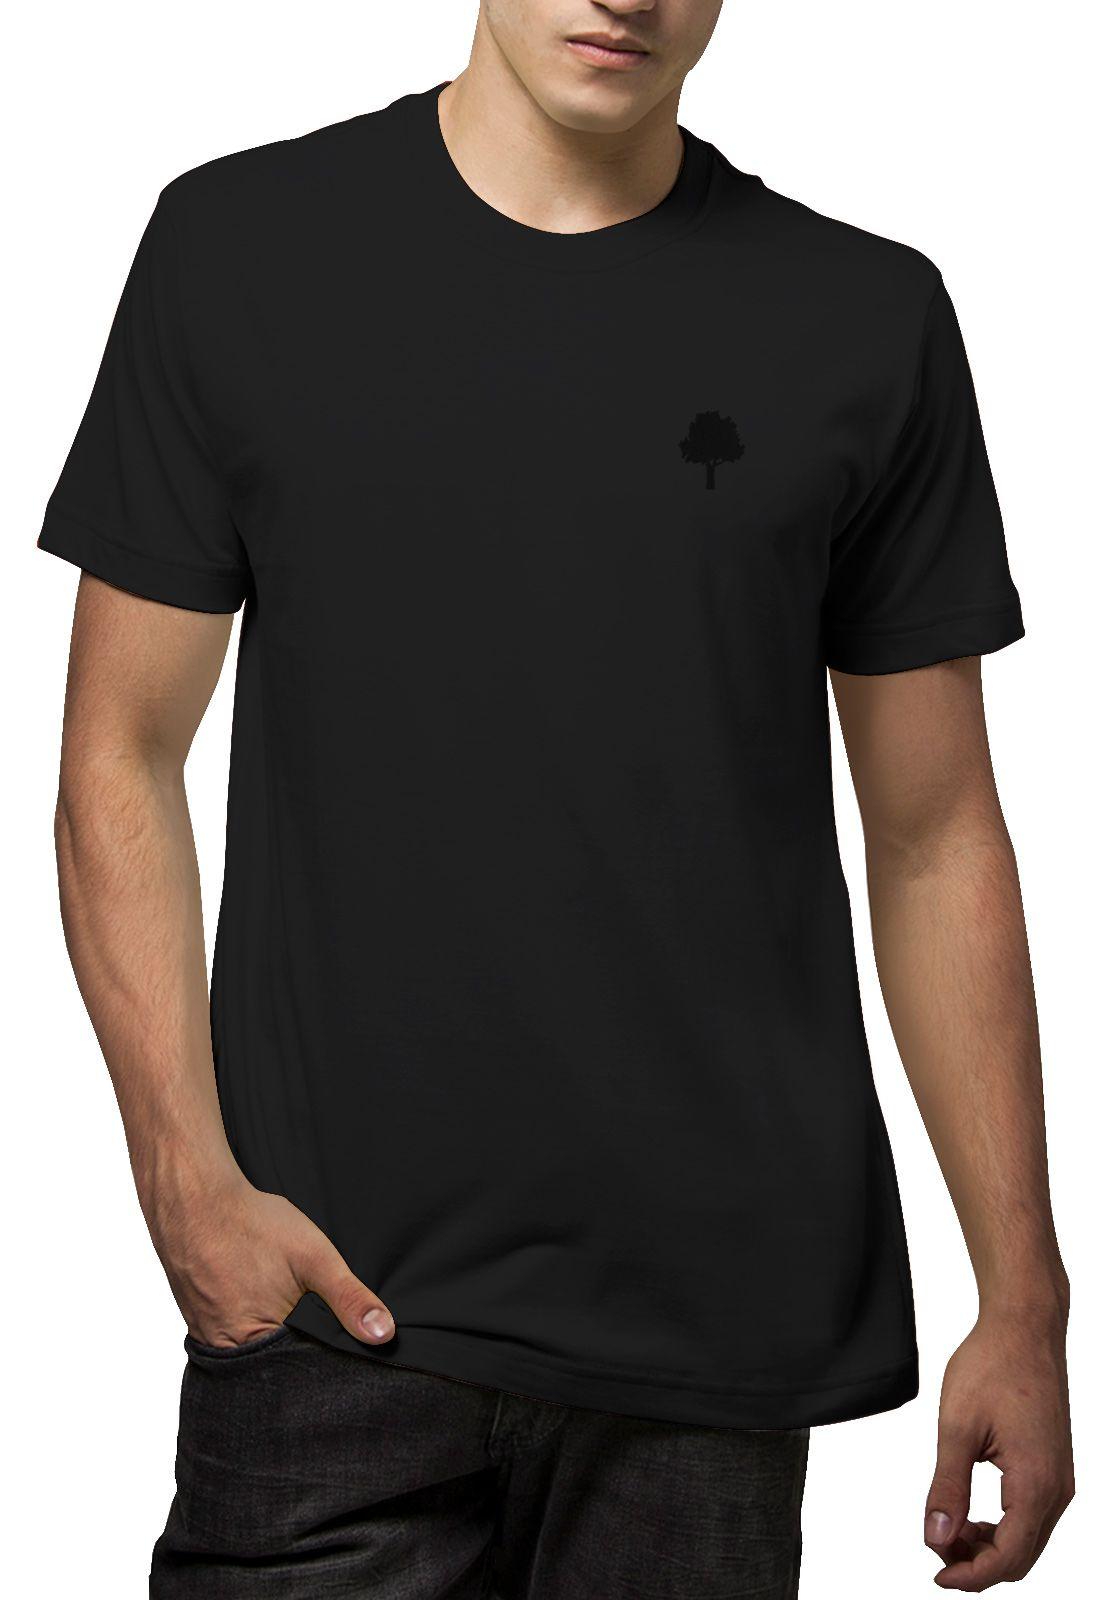 Camiseta Amazônia Básica Árvore Bordada - Preto